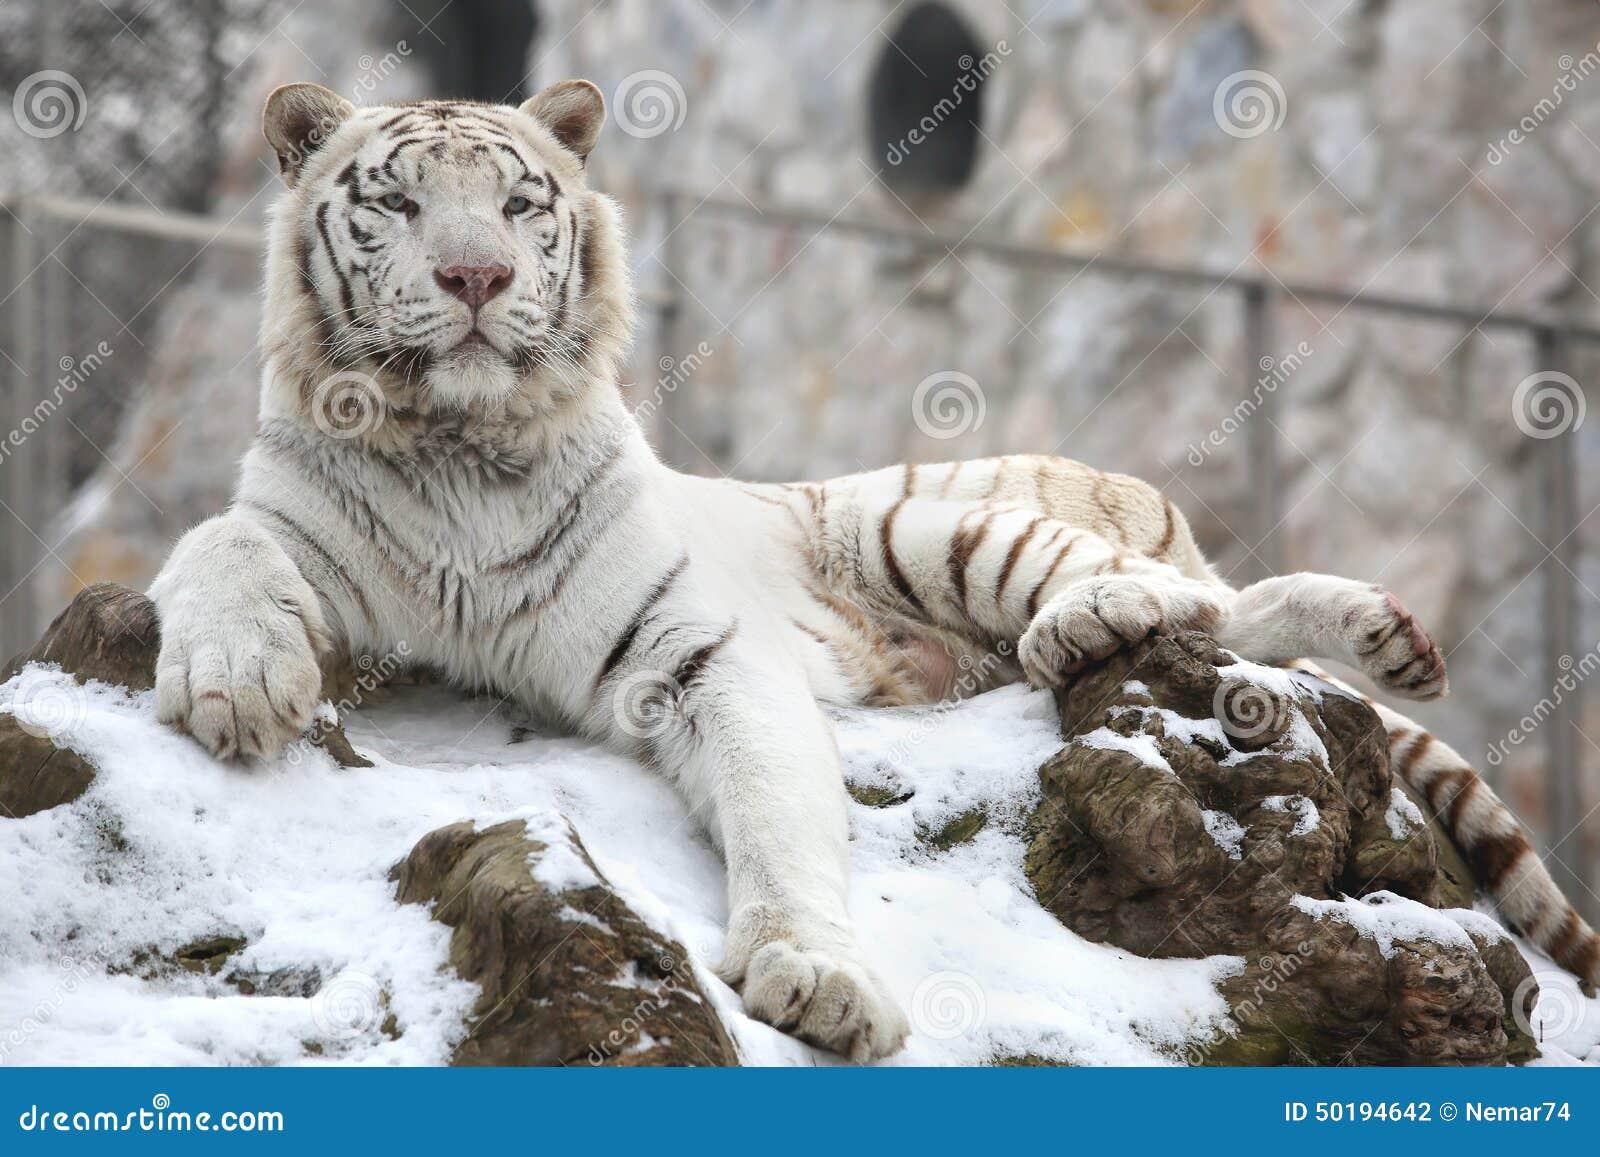 White siberian tiger in snow - photo#14